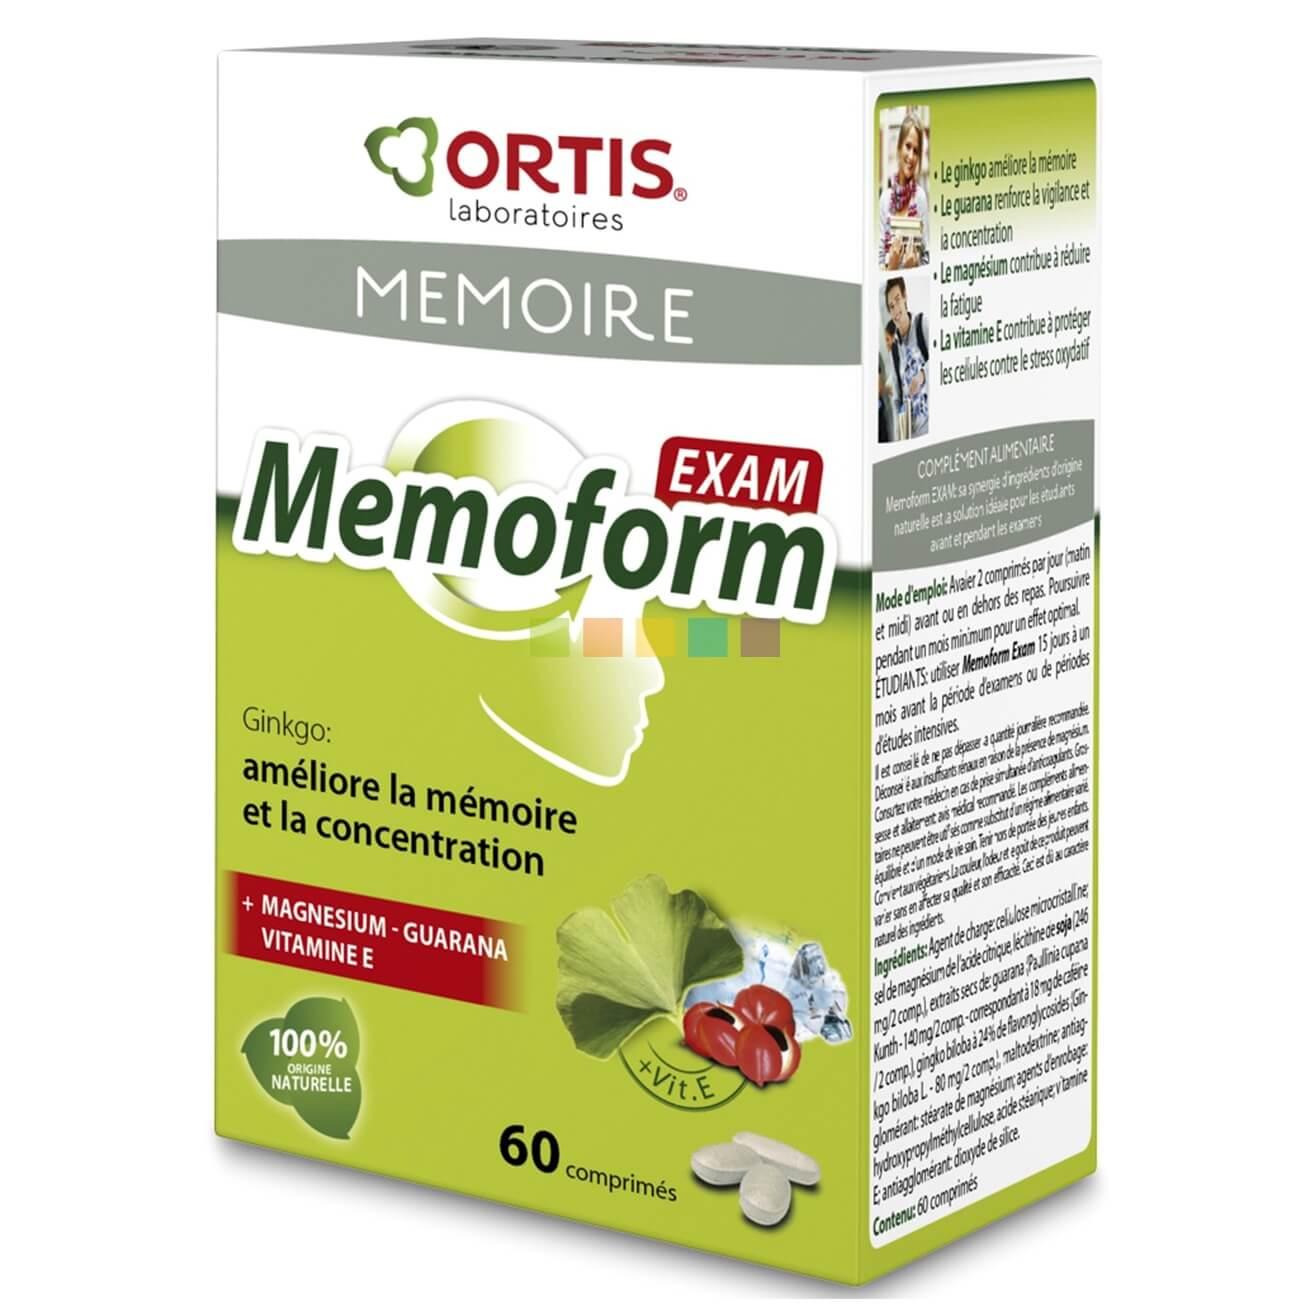 Ortis Memoform Exam Συμπλήρωμα Διατροφής για την Ενίσχυση της Μνήμης & της Συγκέντρωσης 60Τabs